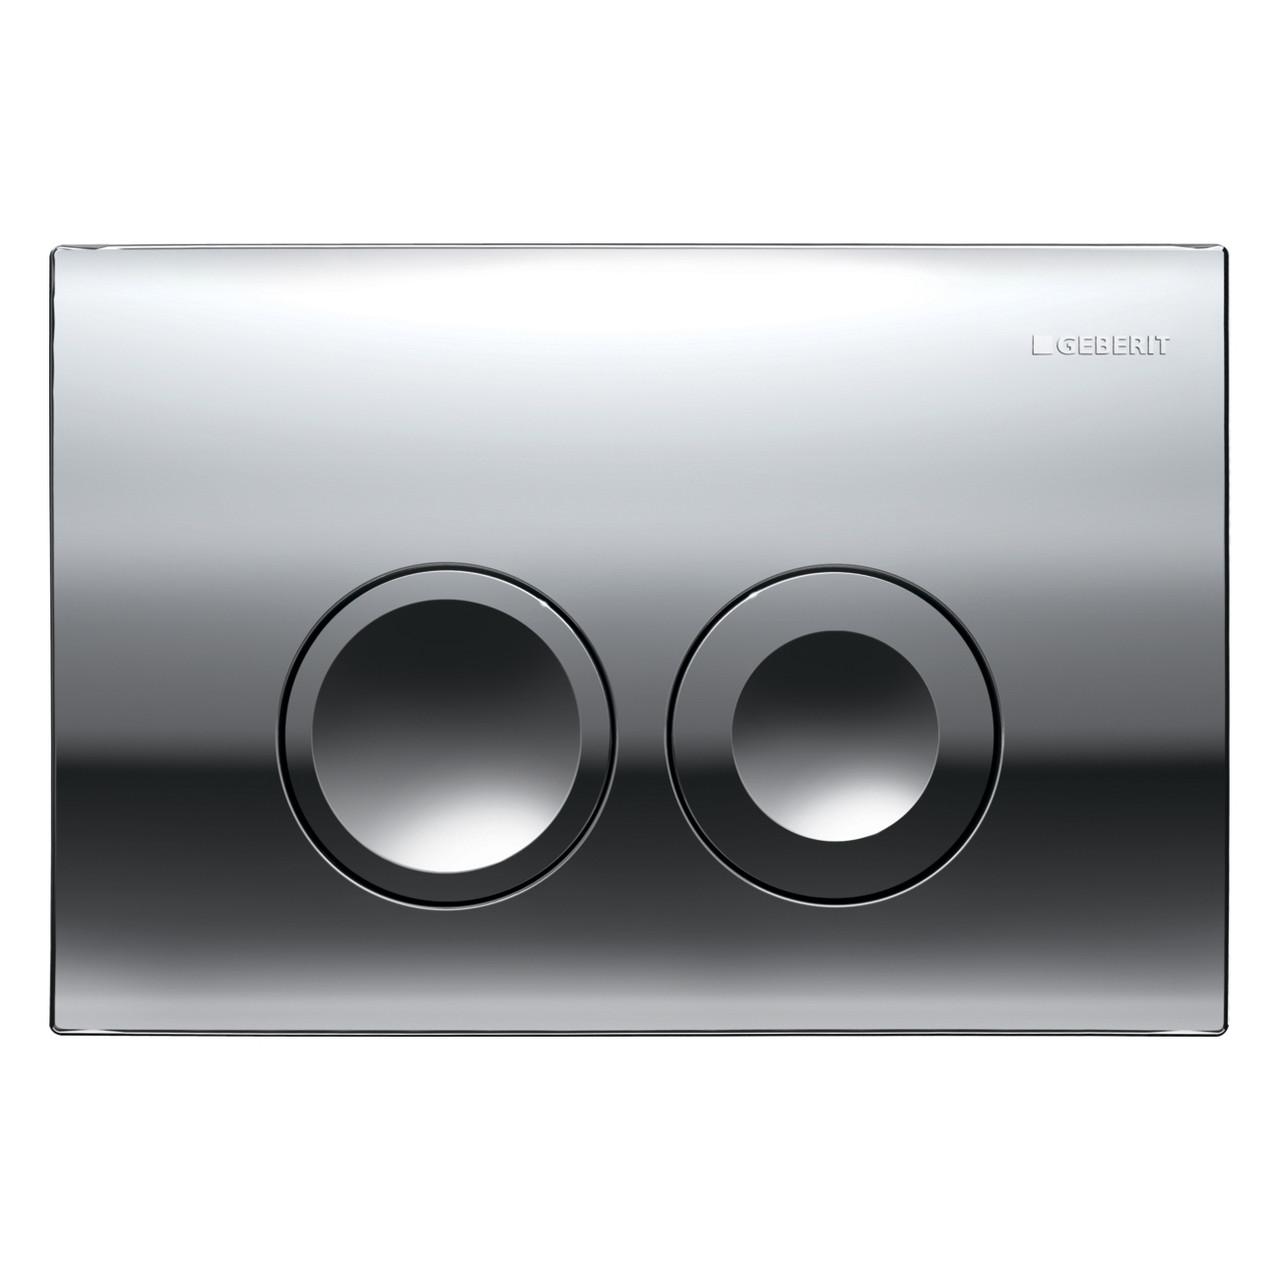 Кнопка смыва GEBERIT DELTA 21 115.125.21.1